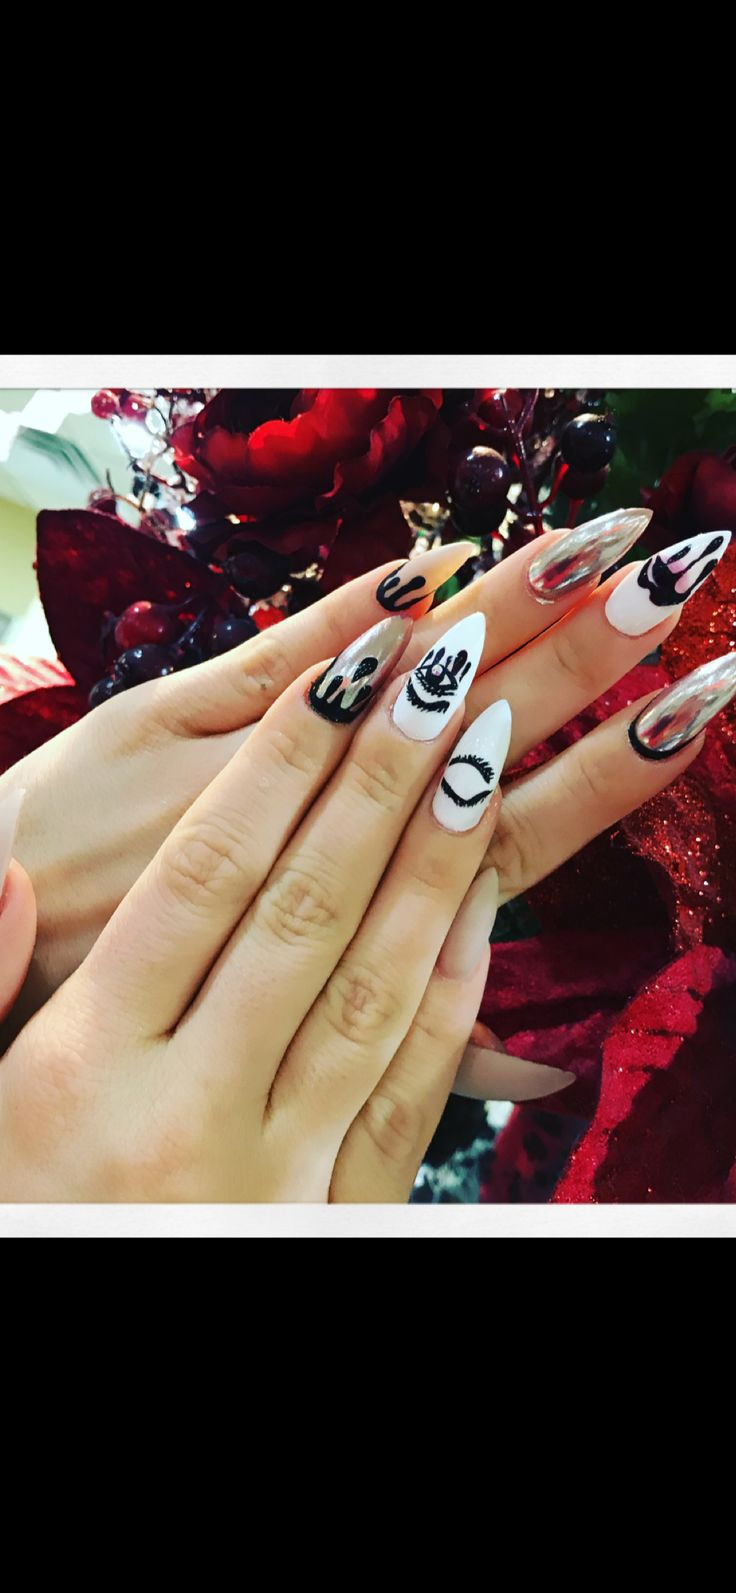 9 beste afbeeldingen van toe nails - Teennagels, Teennagelkunst en ...